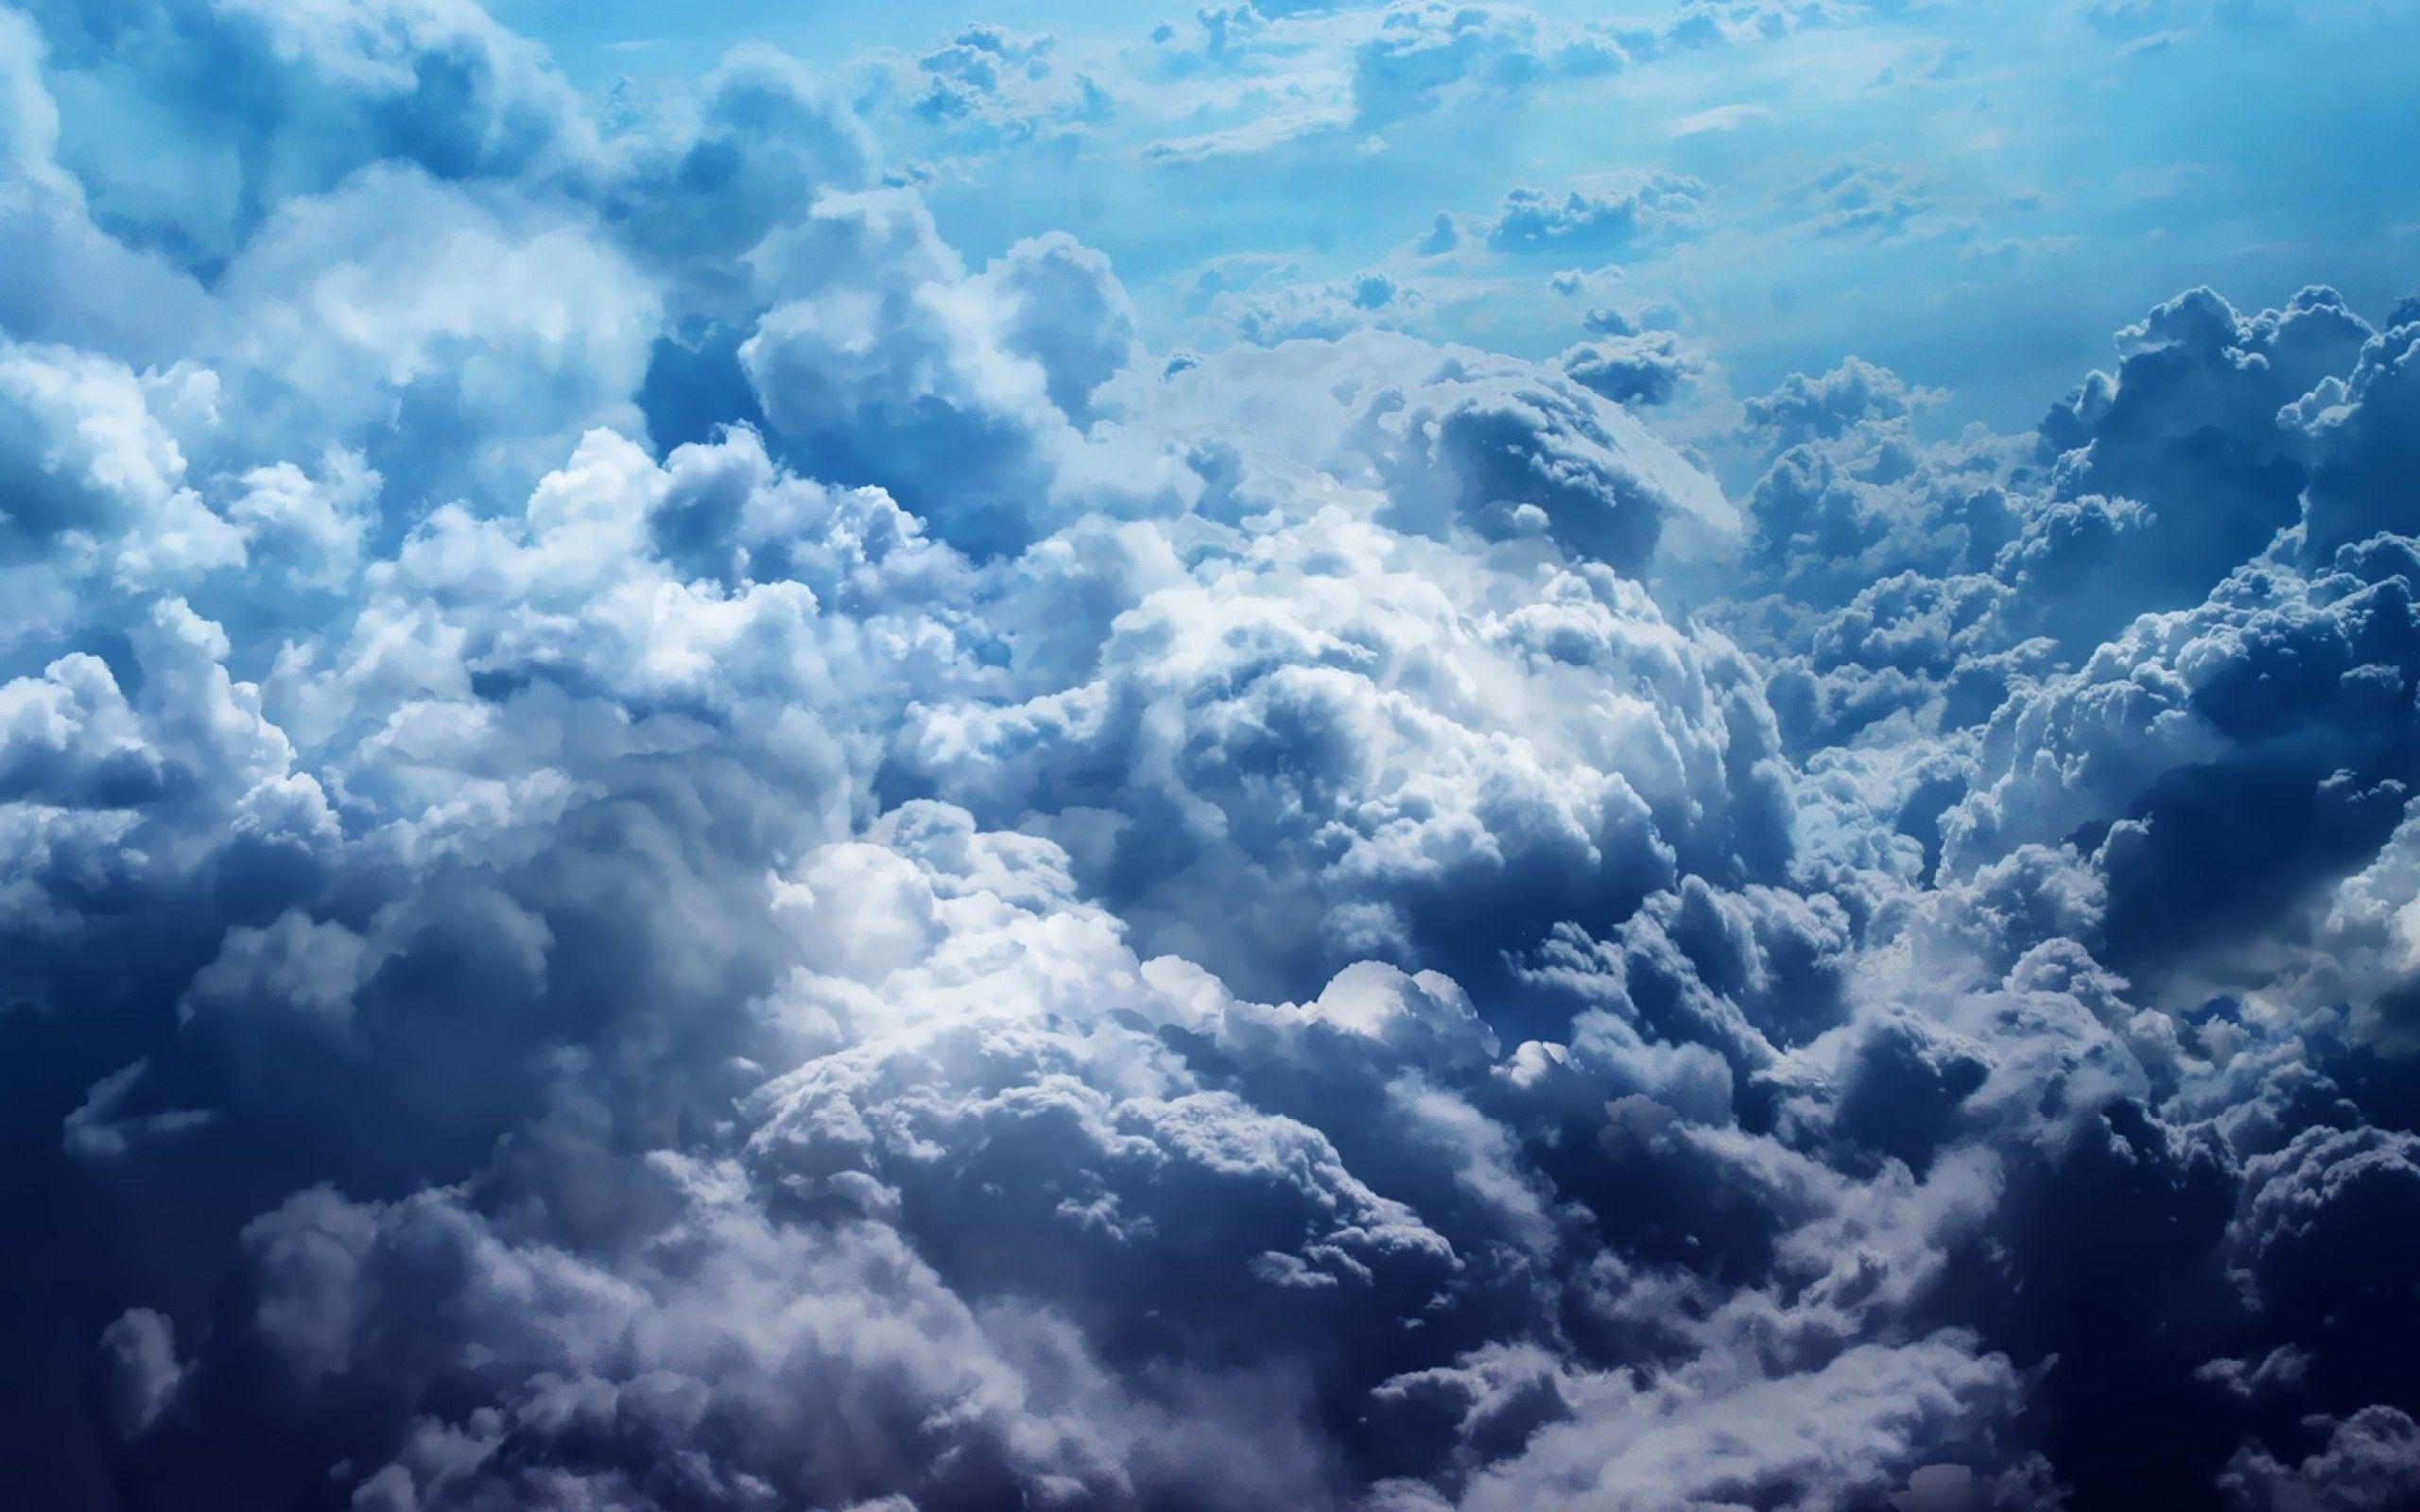 Labels Sky Cloud Wallpapers Hd: Pin By Blake Wise On Digital Wallpaper